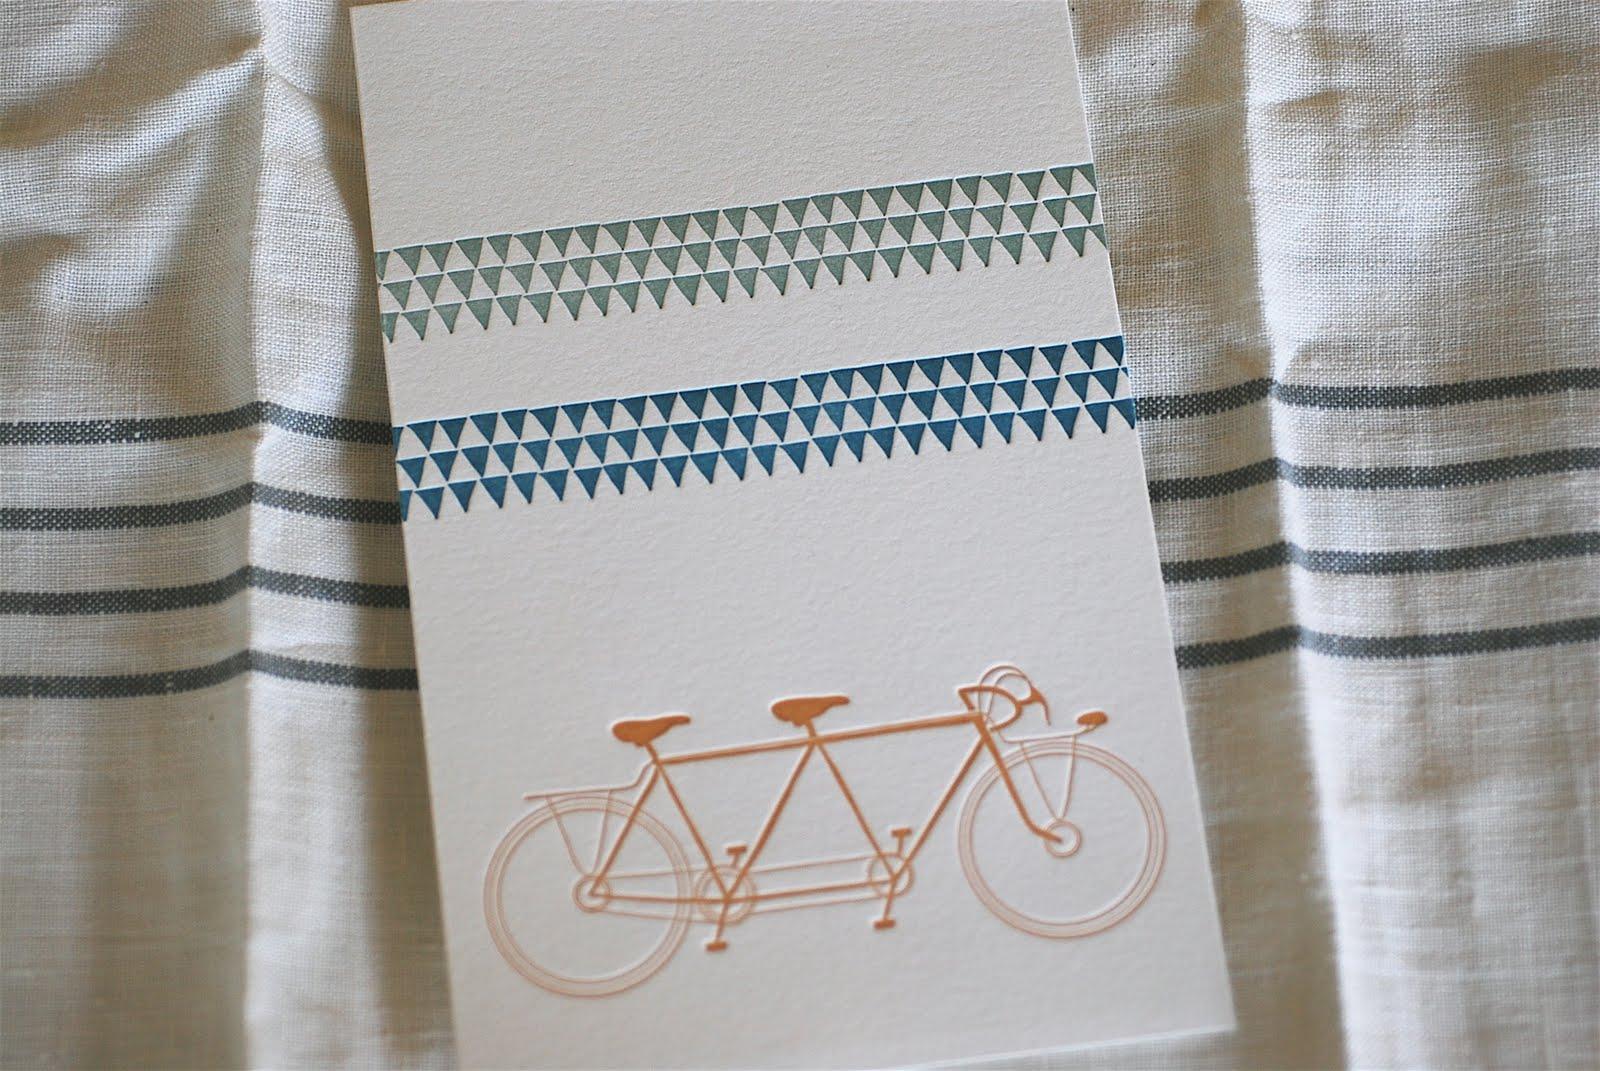 new card + print from satsuma press poppytalk handmade artists